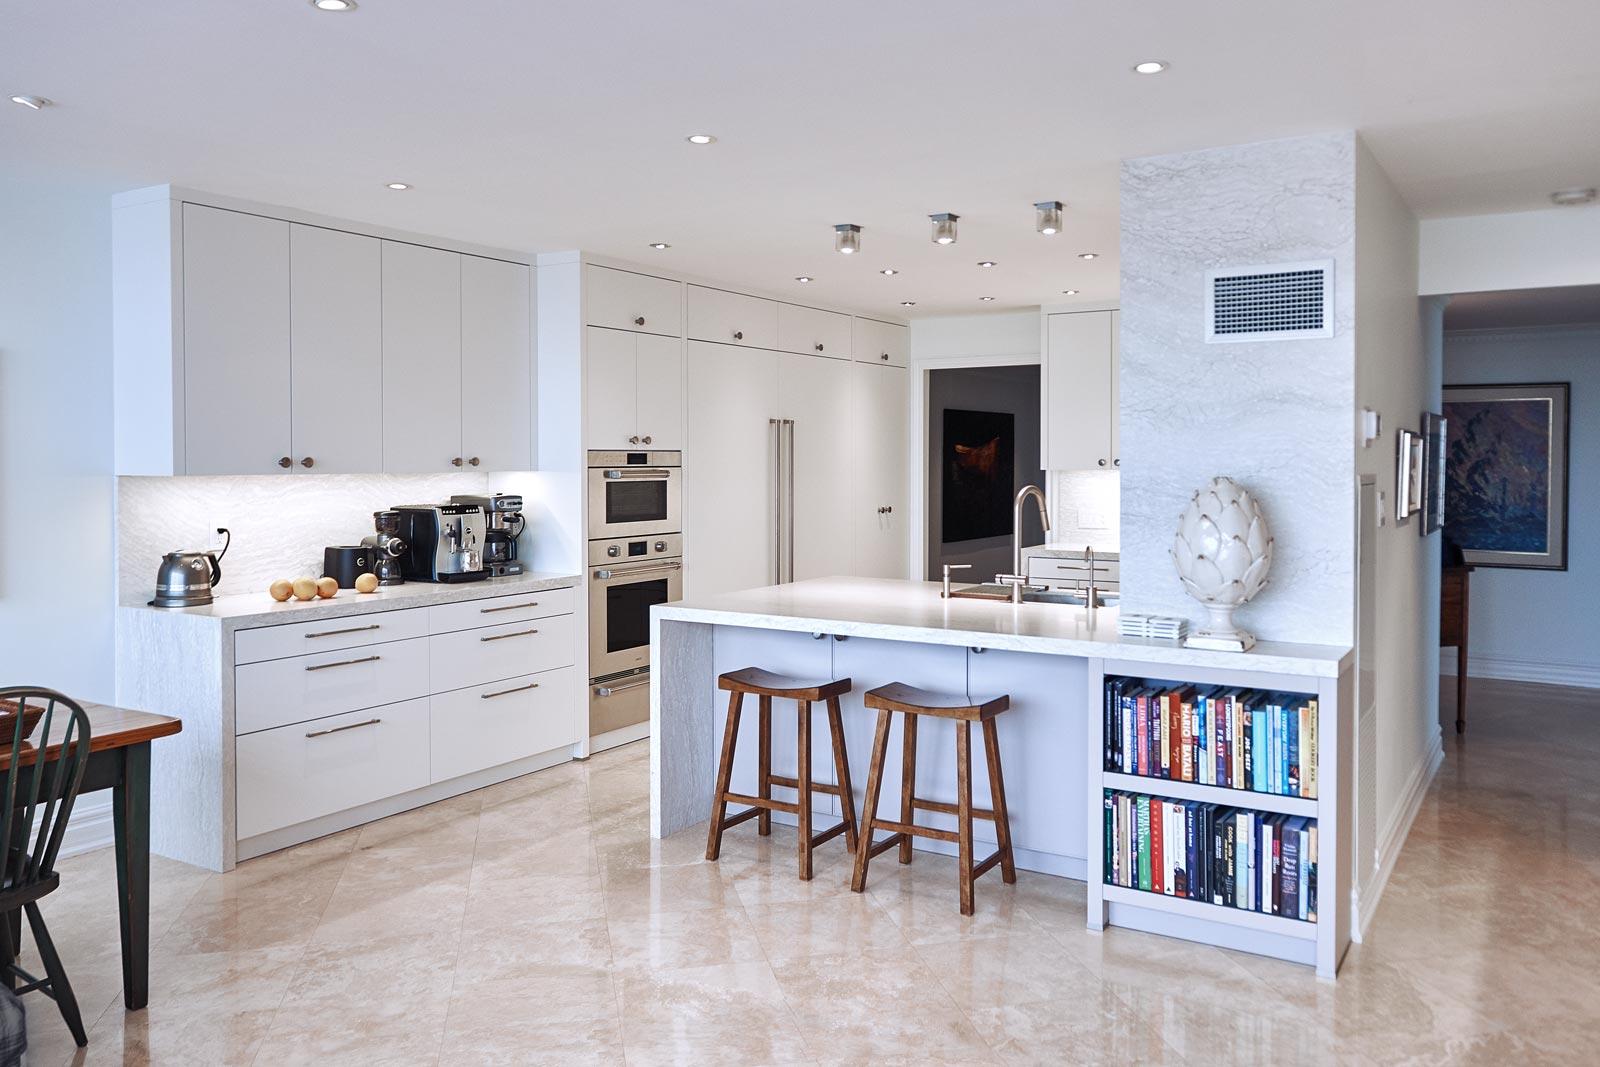 Luxury Kitchen Renovation at Palace Pier Condominium in Etobicoke, Canada